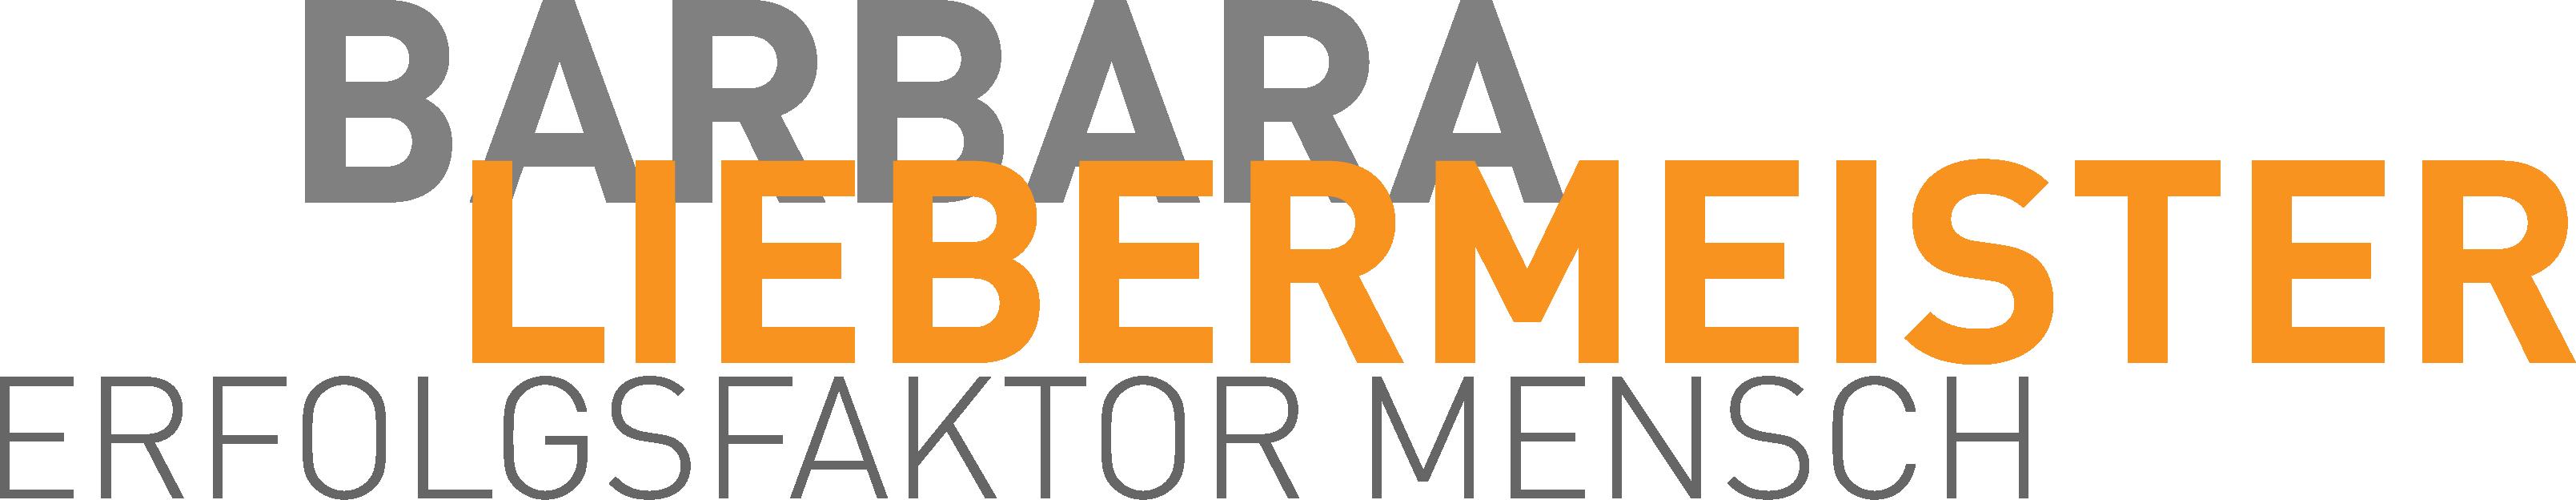 Erfolgsfaktor Mensch Logo